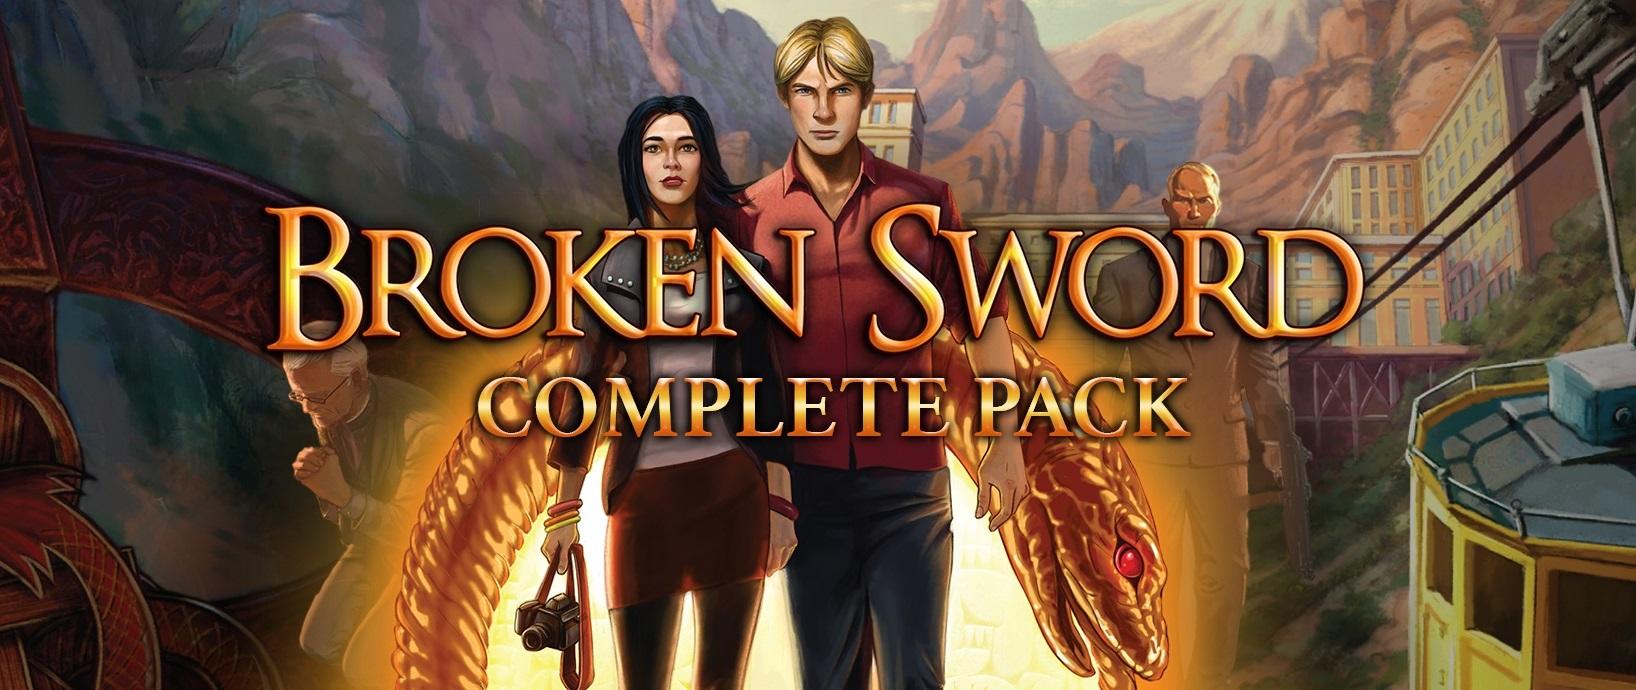 Bundle Stars: Saga completa de Broken Sword por 4.38 euros